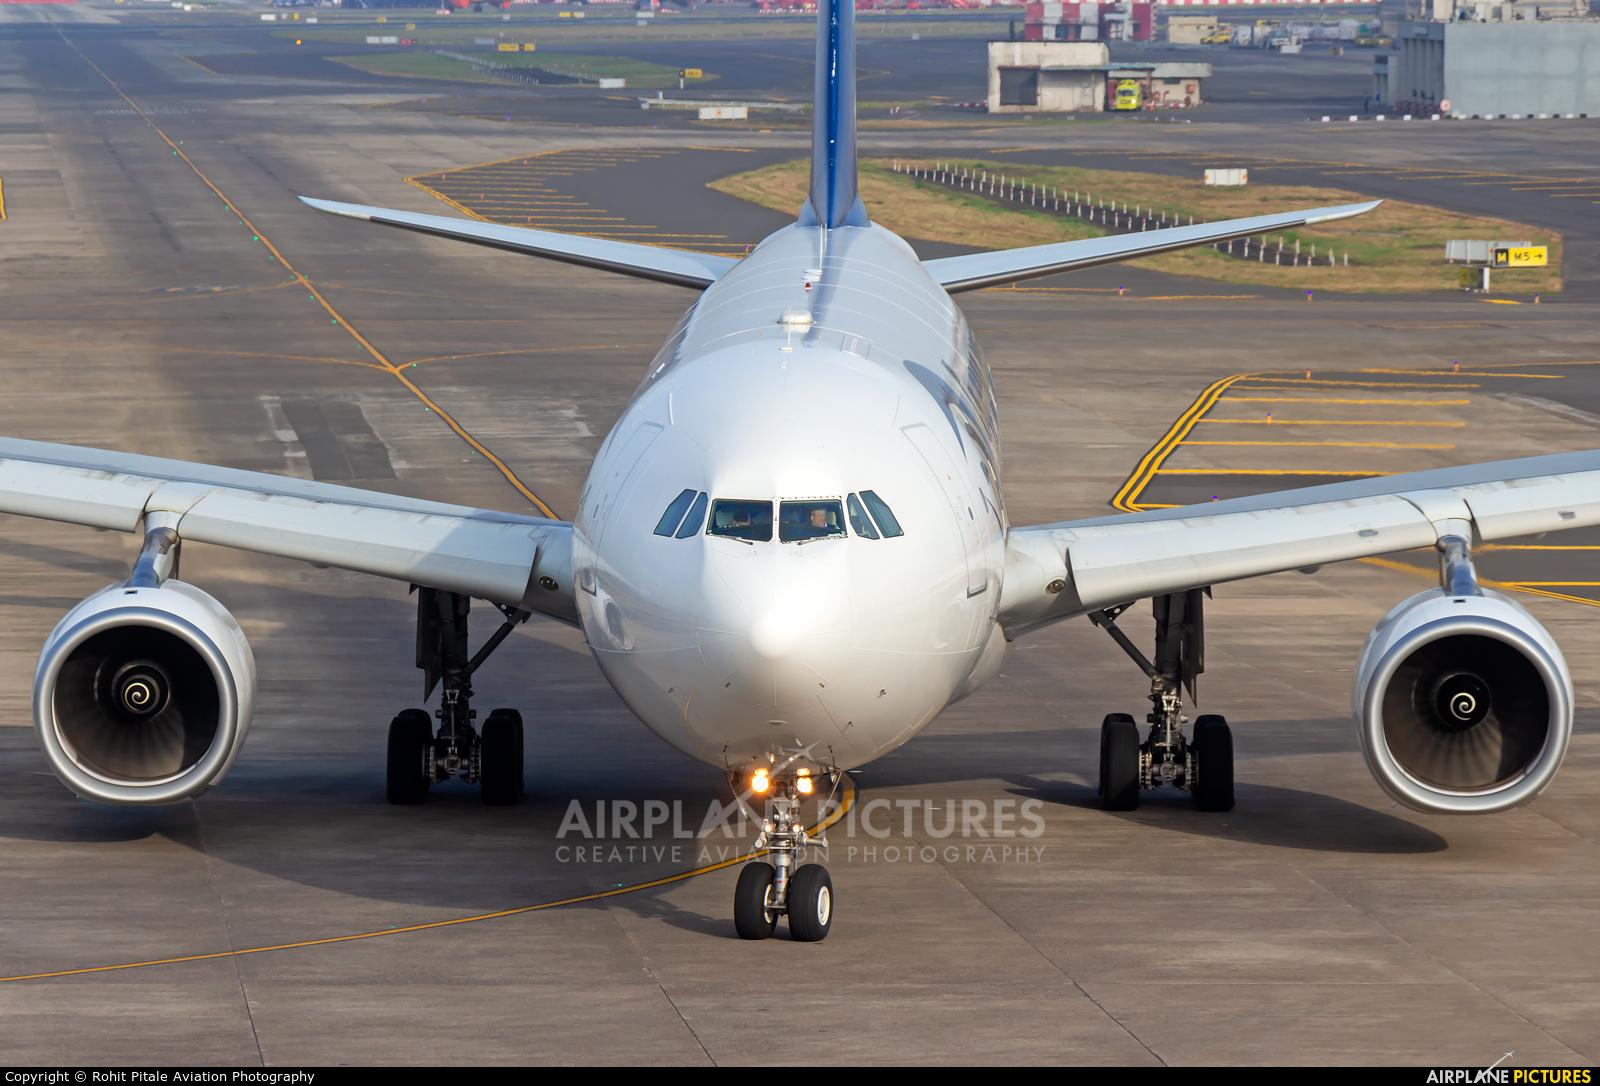 Egyptair Cargo SU-GCJ aircraft at Mumbai - Chhatrapati Shivaji Intl